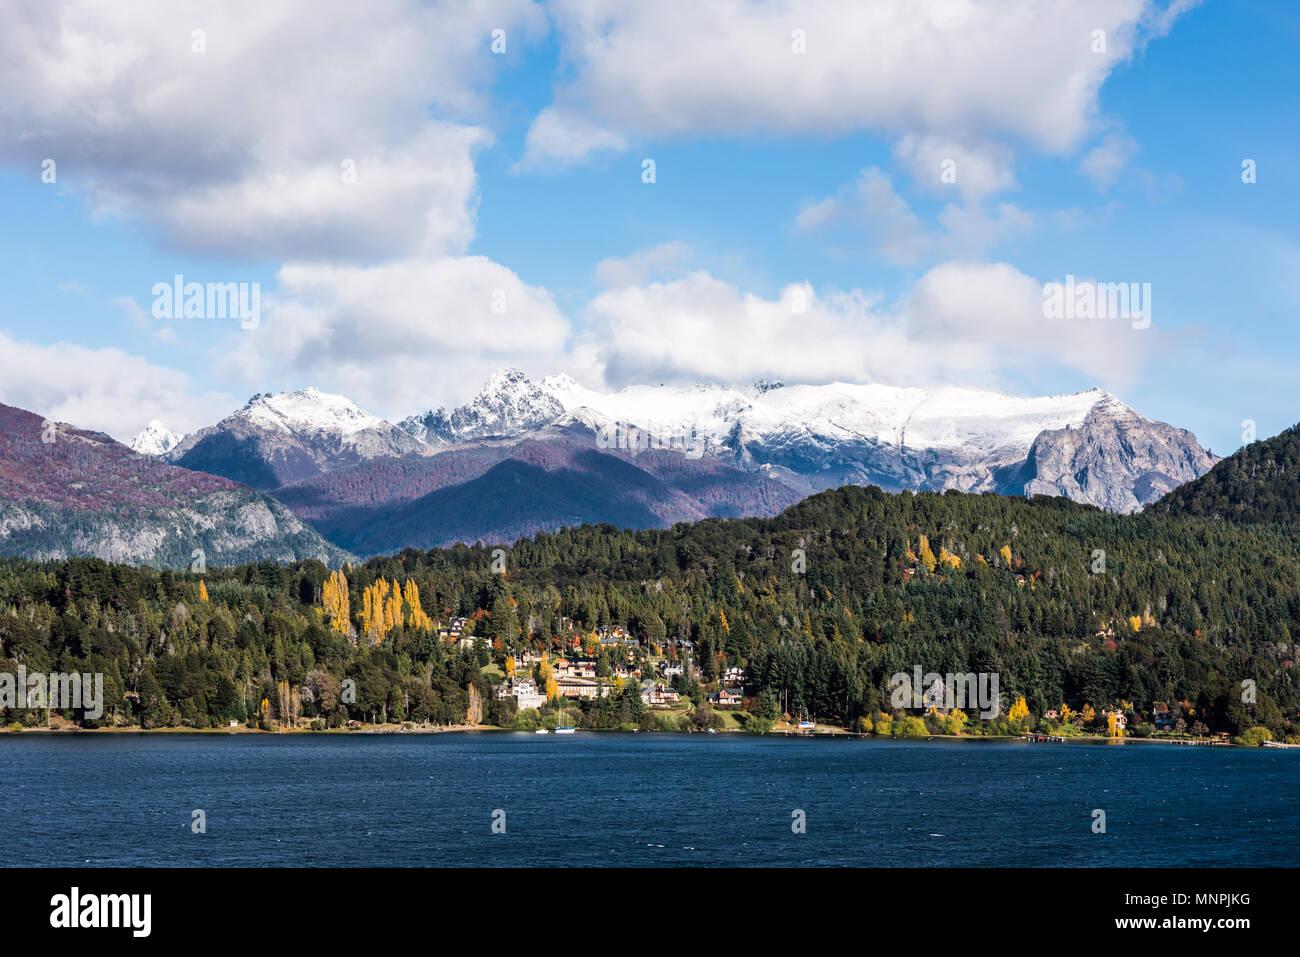 Autumn Colors in Nahuel Huapi lake, Patagonia - Argentina, near Bariloche - Stock Image